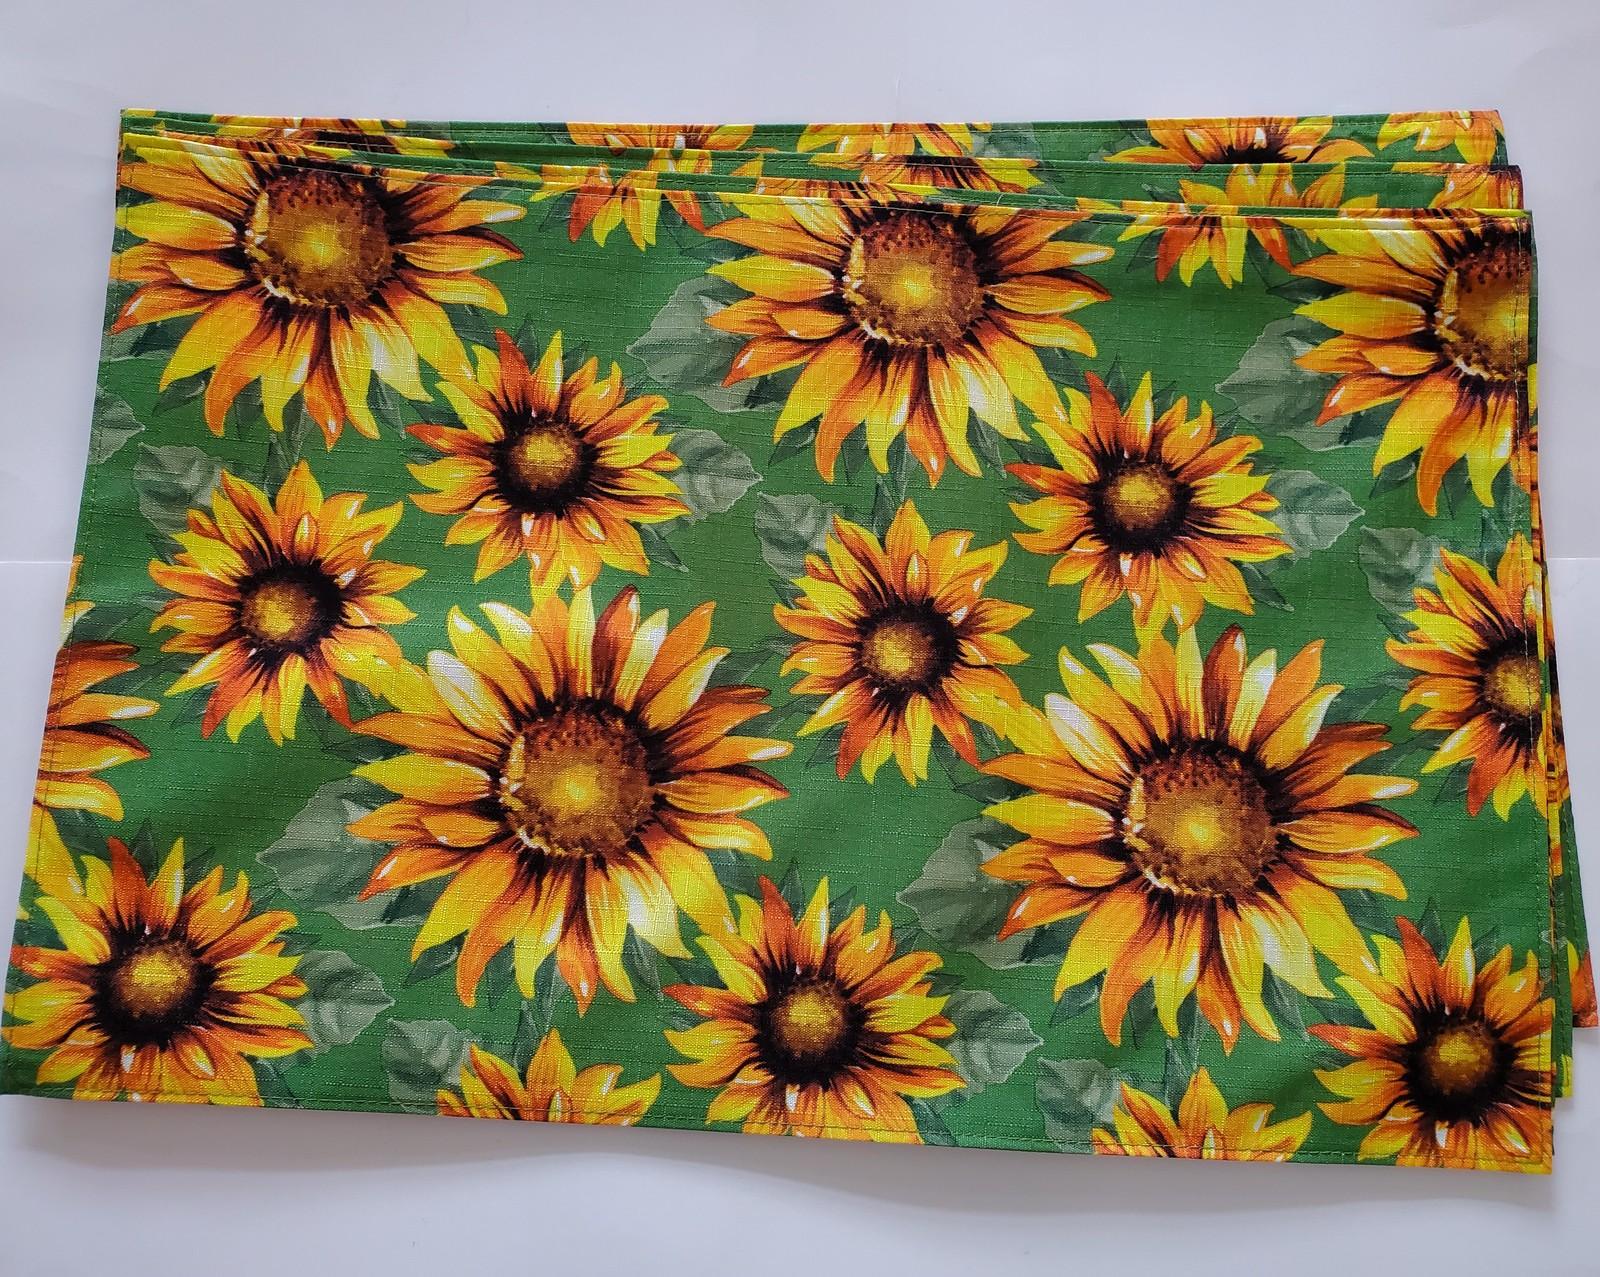 Sunflowergreenbrown placemats